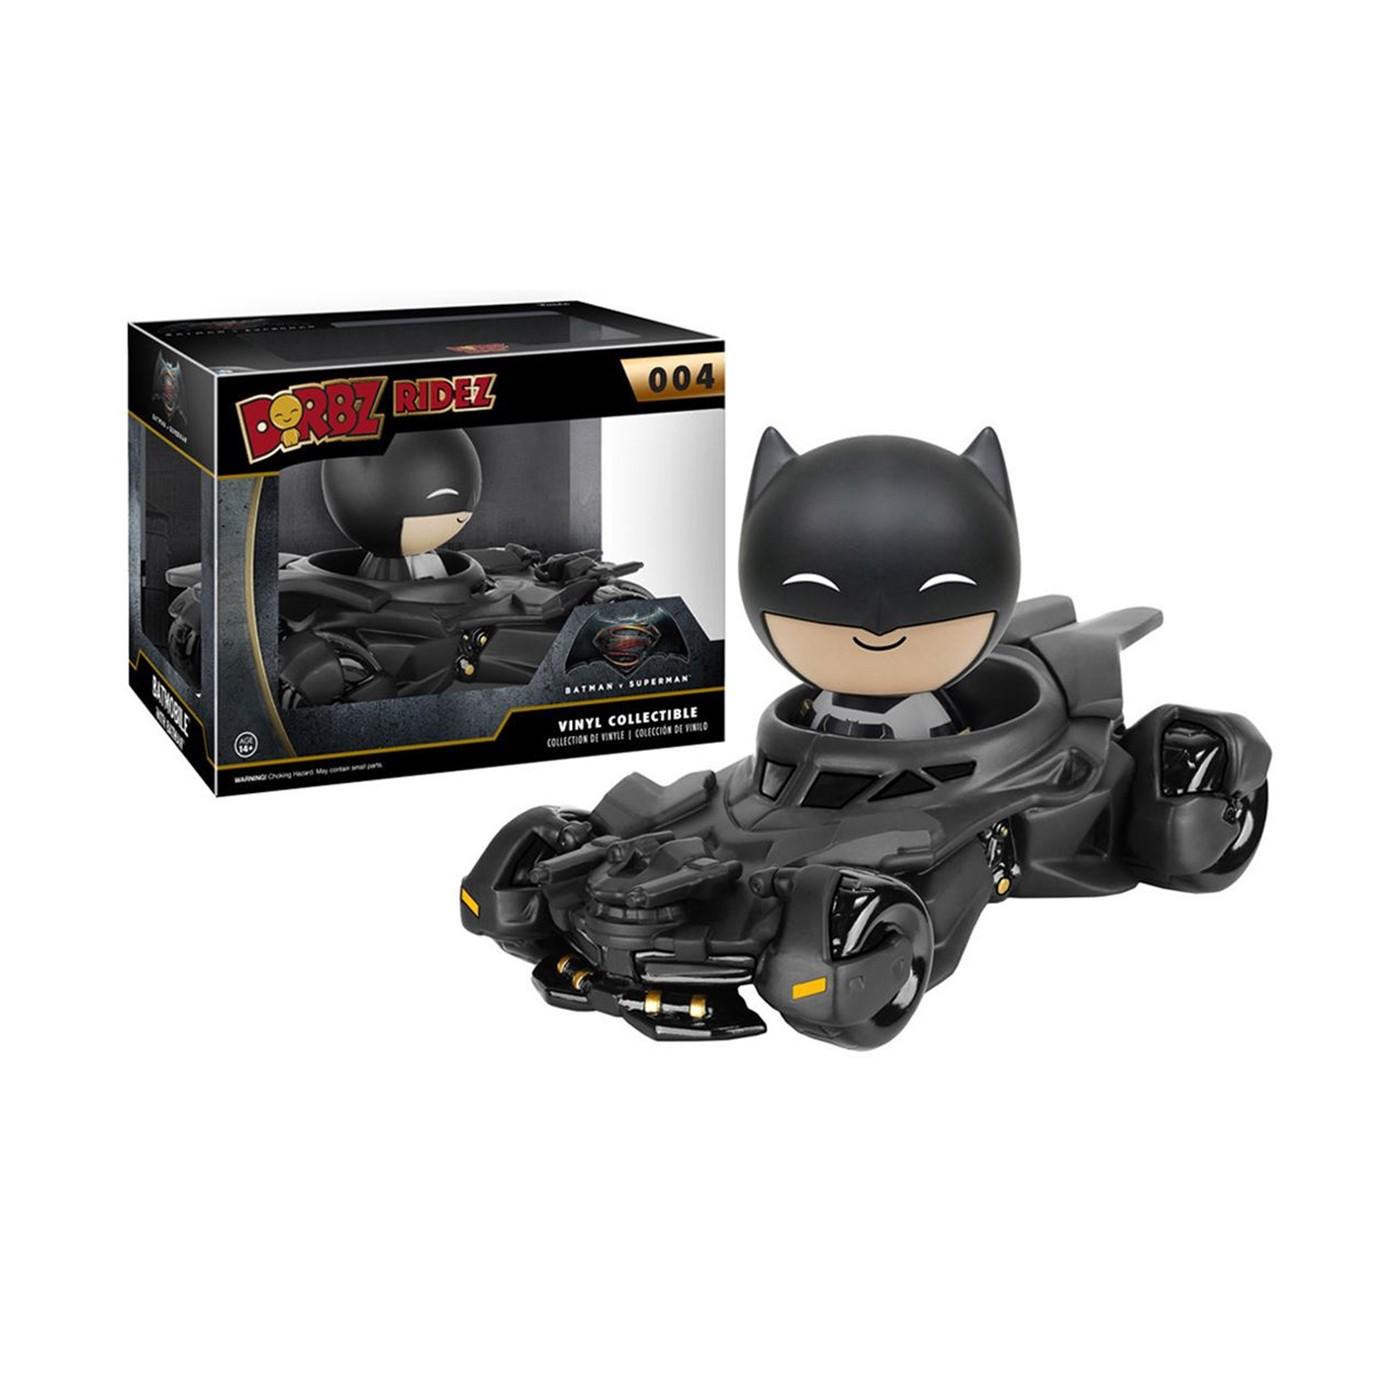 Batman Vs Superman Batmobile Dorbz Figure Set